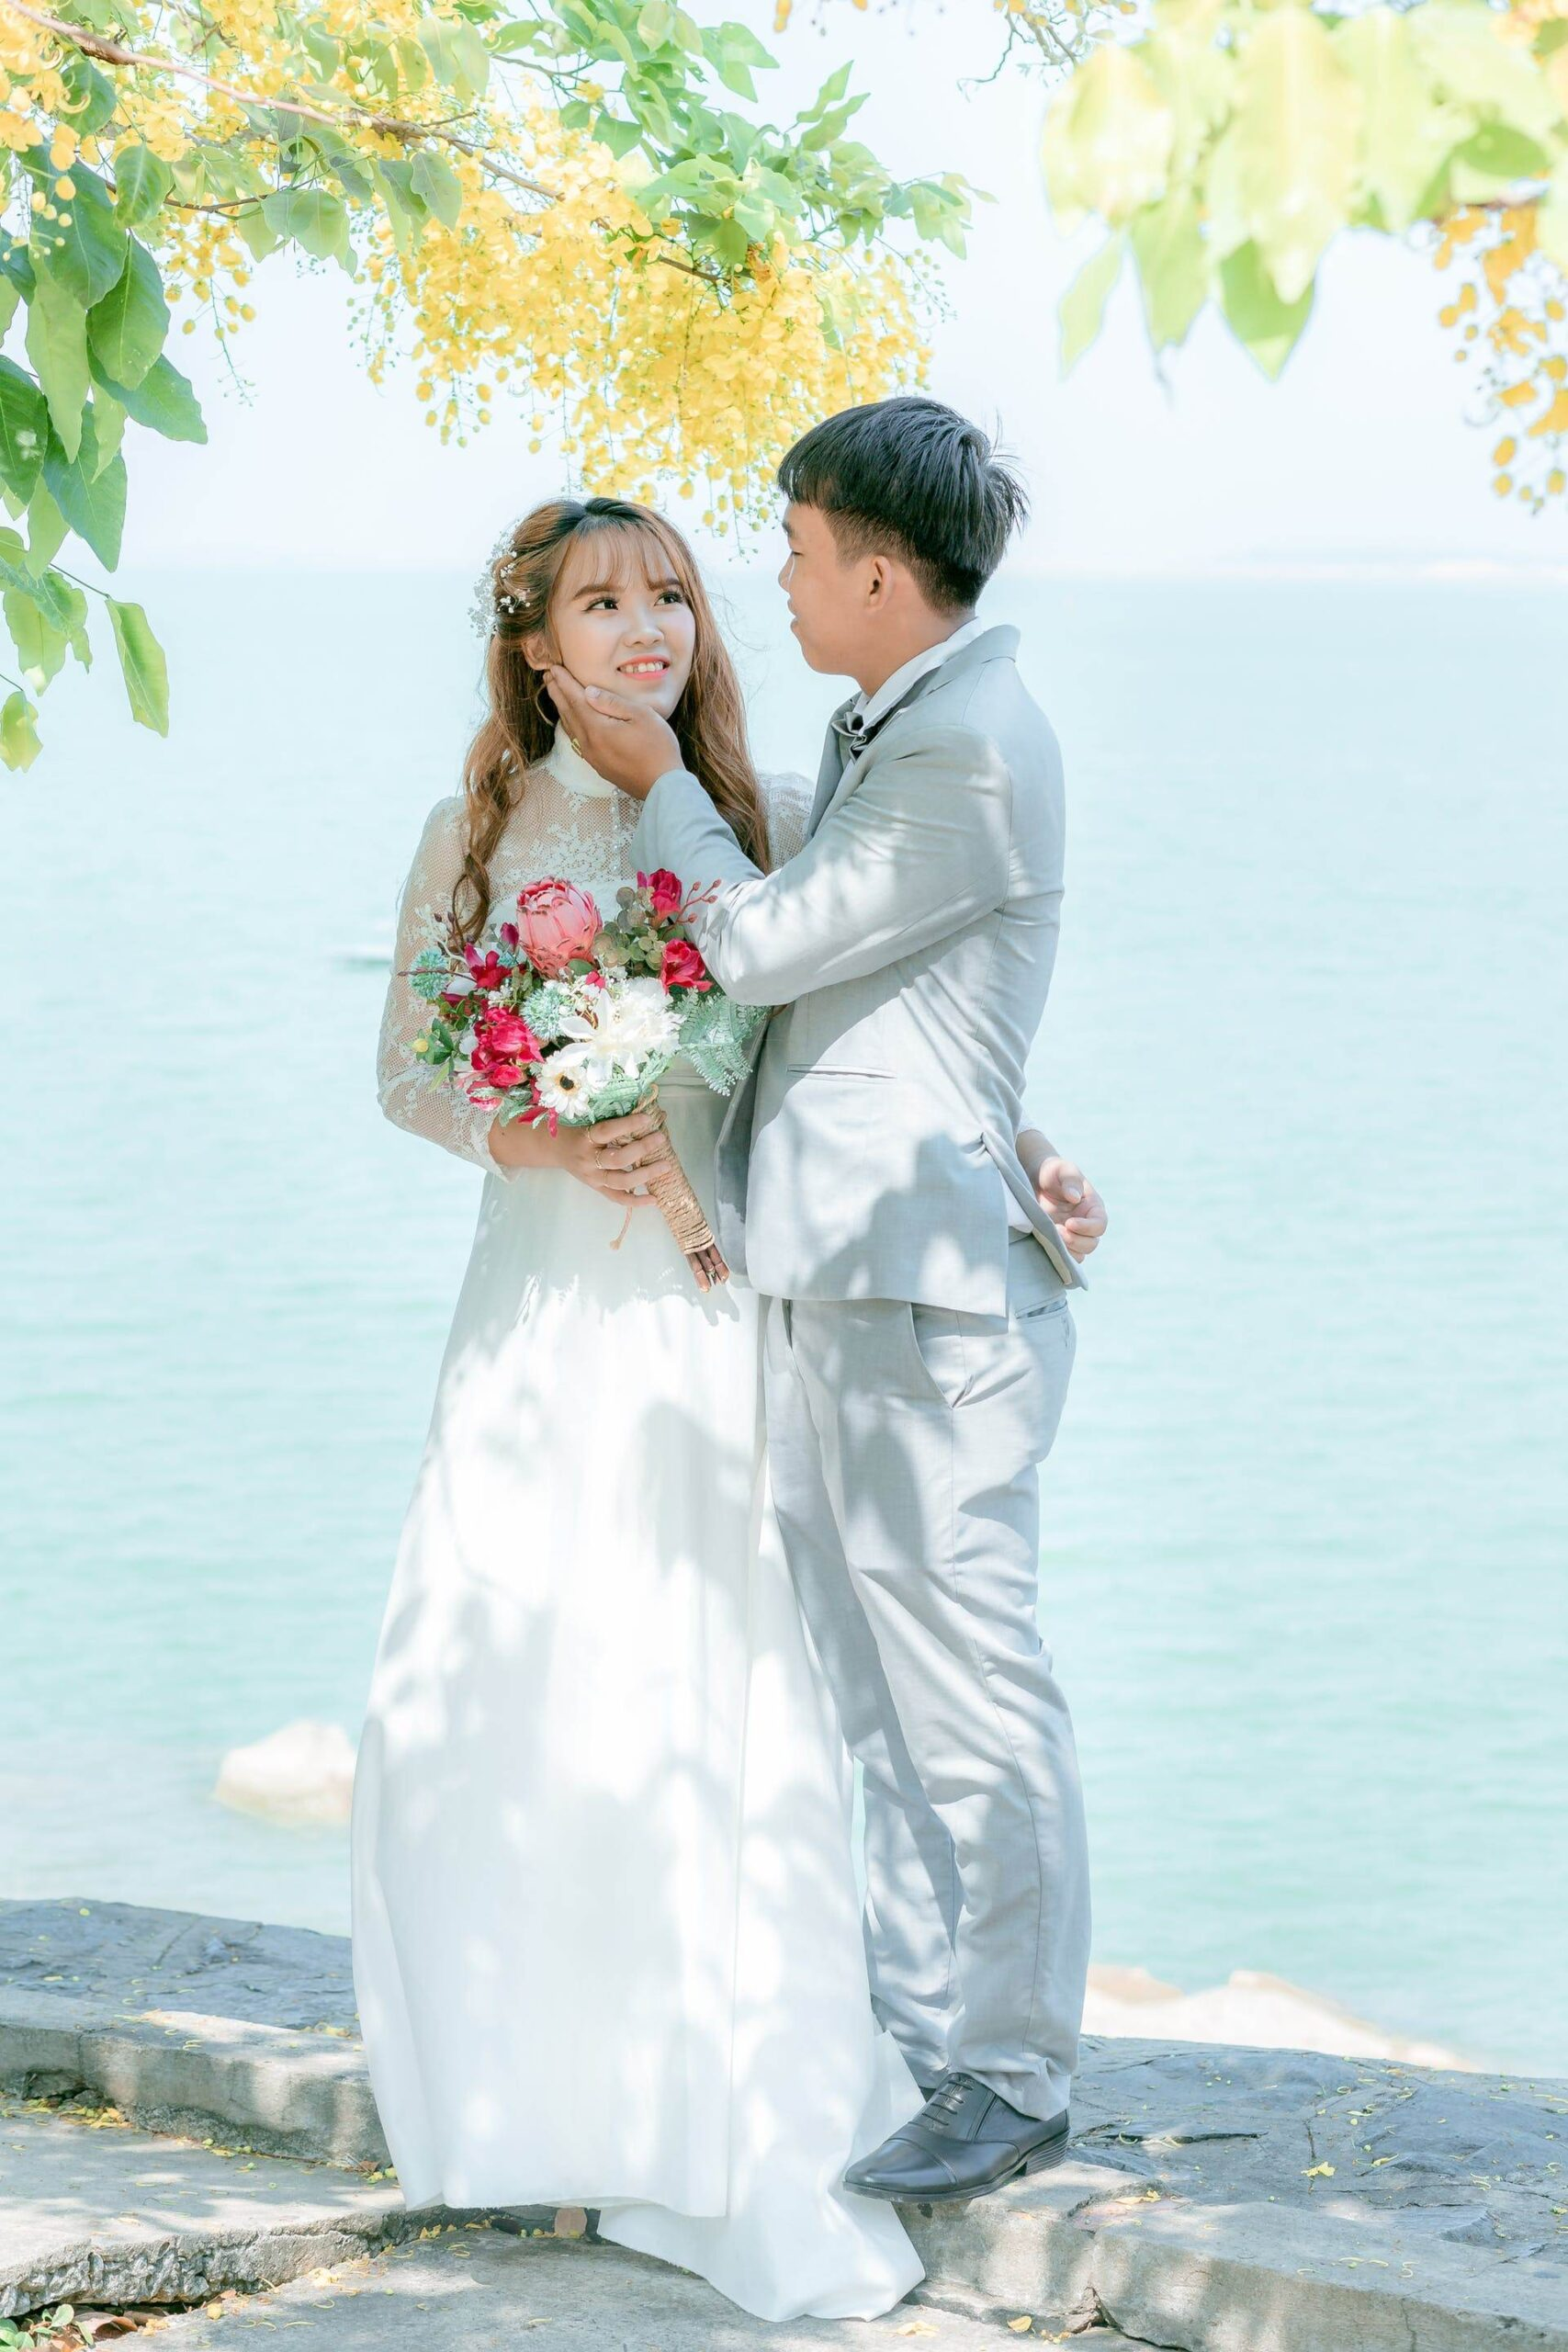 Wedding-Dresses-3446